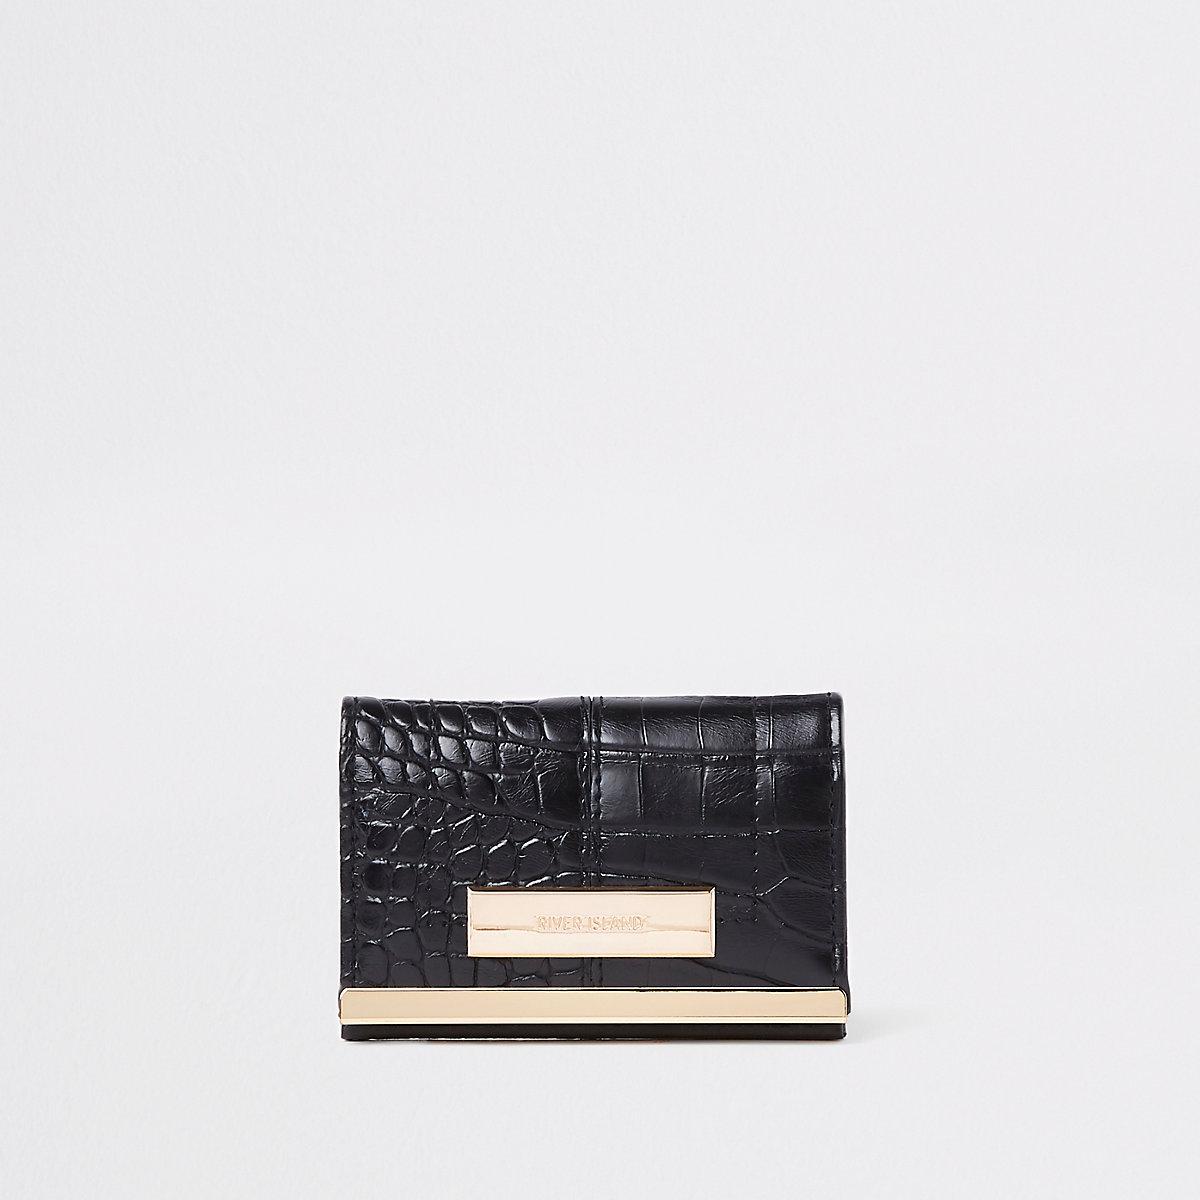 Black croc travel card holder